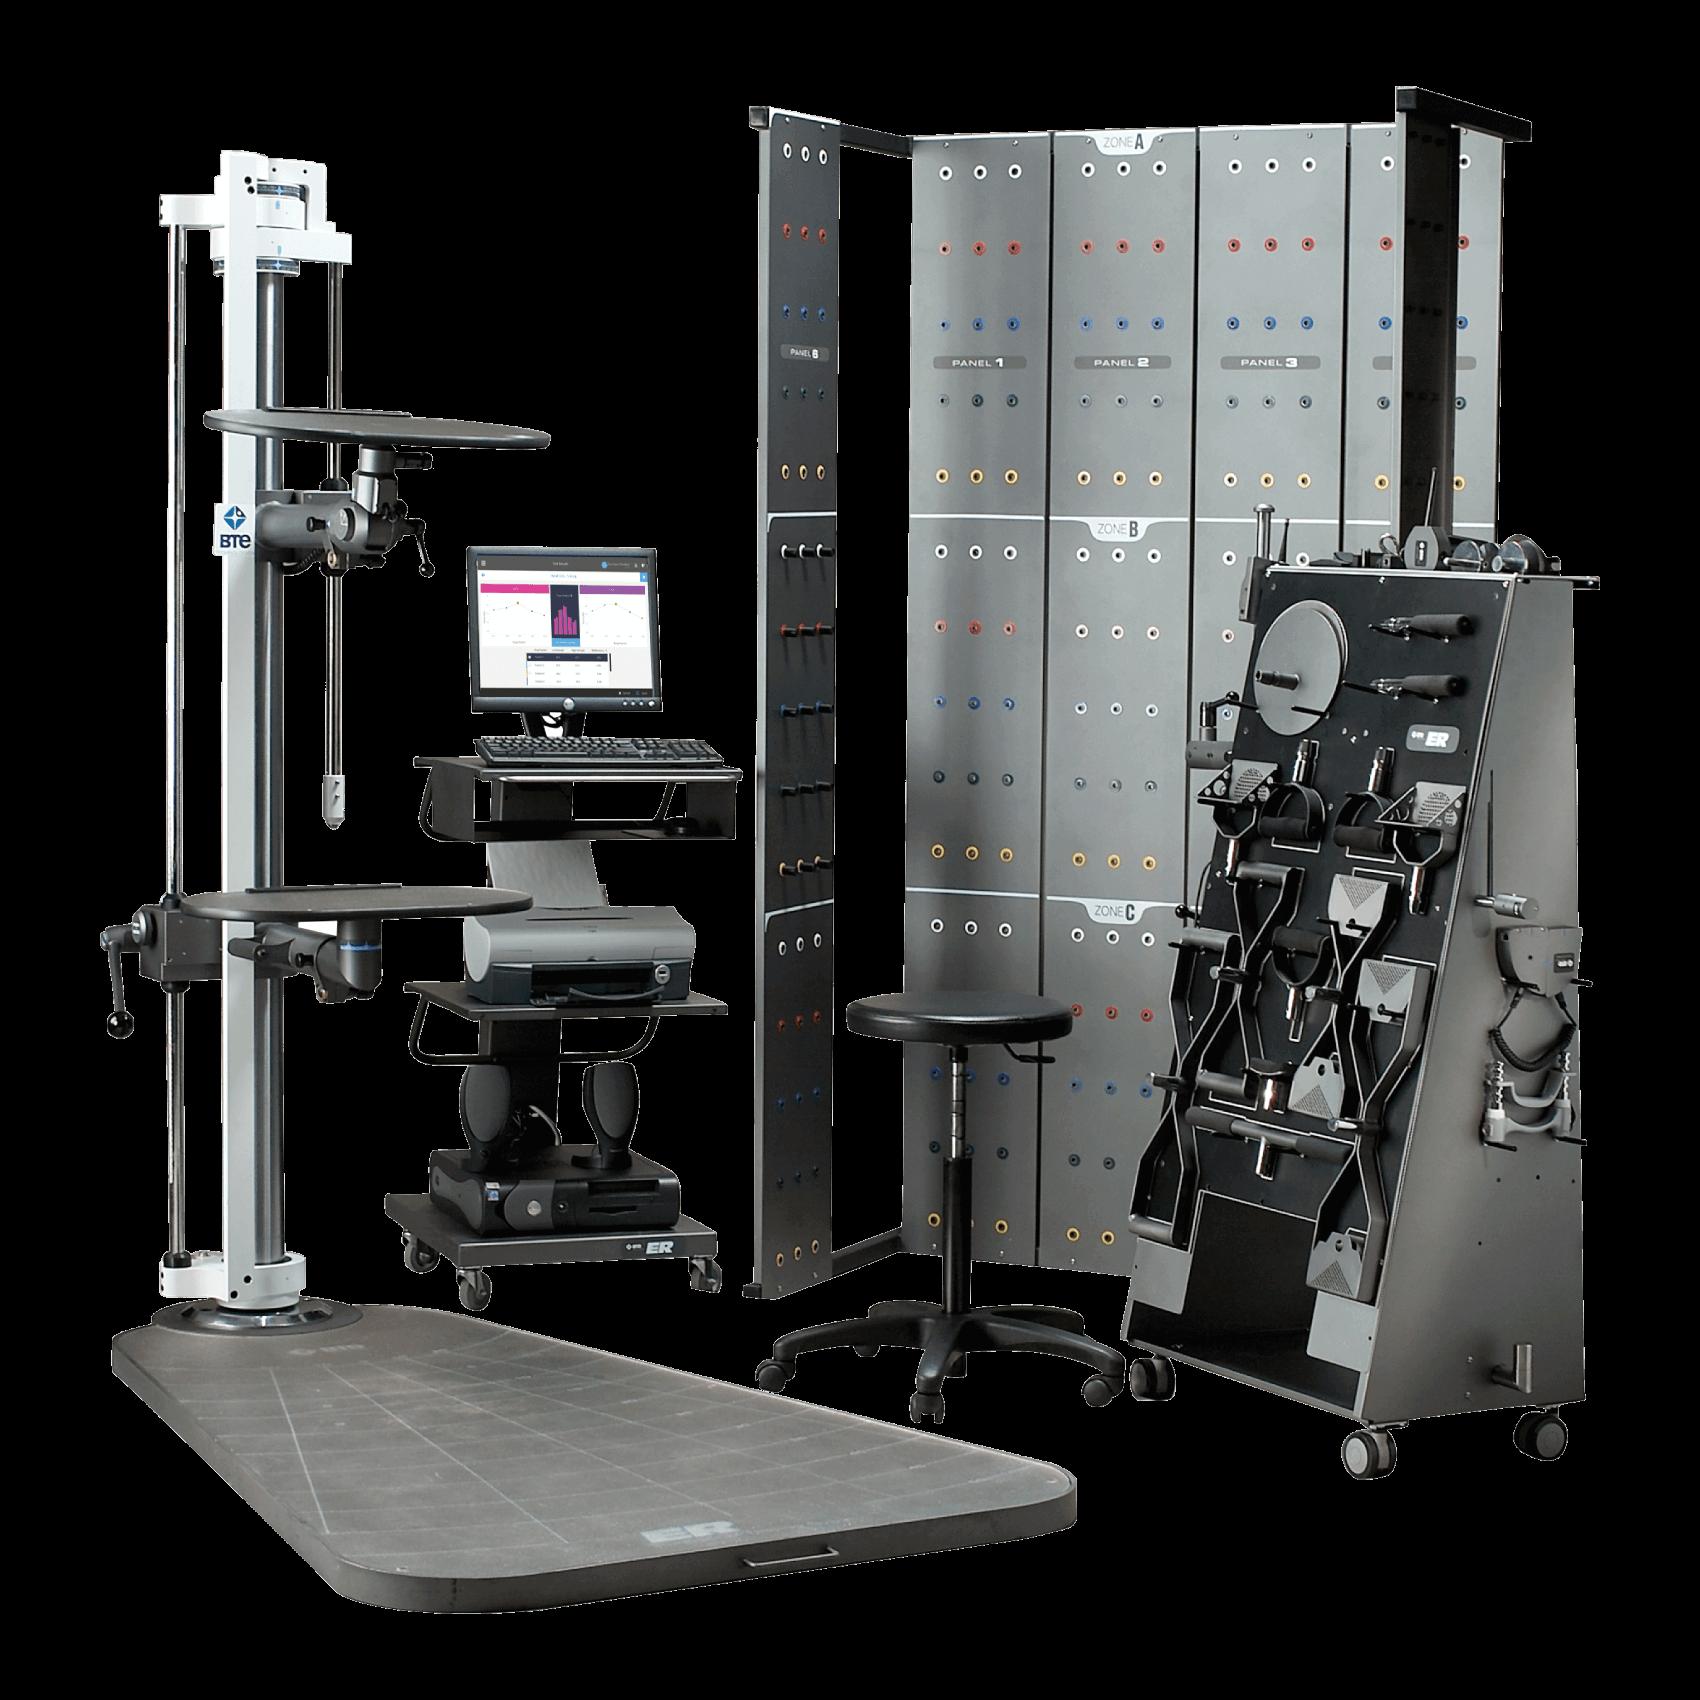 evaltech-premiere-functional-testing-system-bte